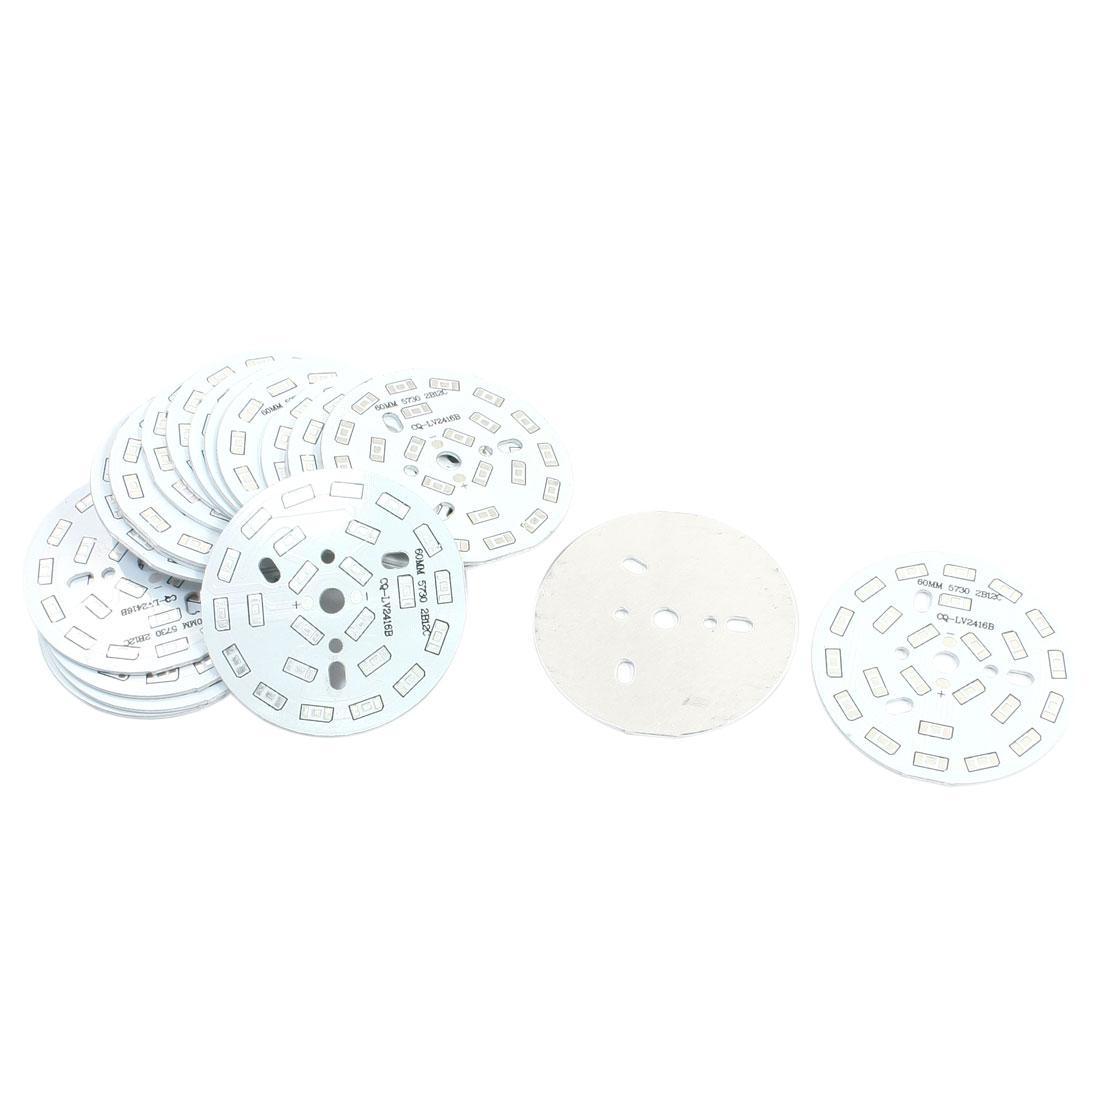 20Pcs 24 x 1/2W 5730 SMD LED High Power DIY Circle Aluminum PCB Circuit Board 60mm Diameter